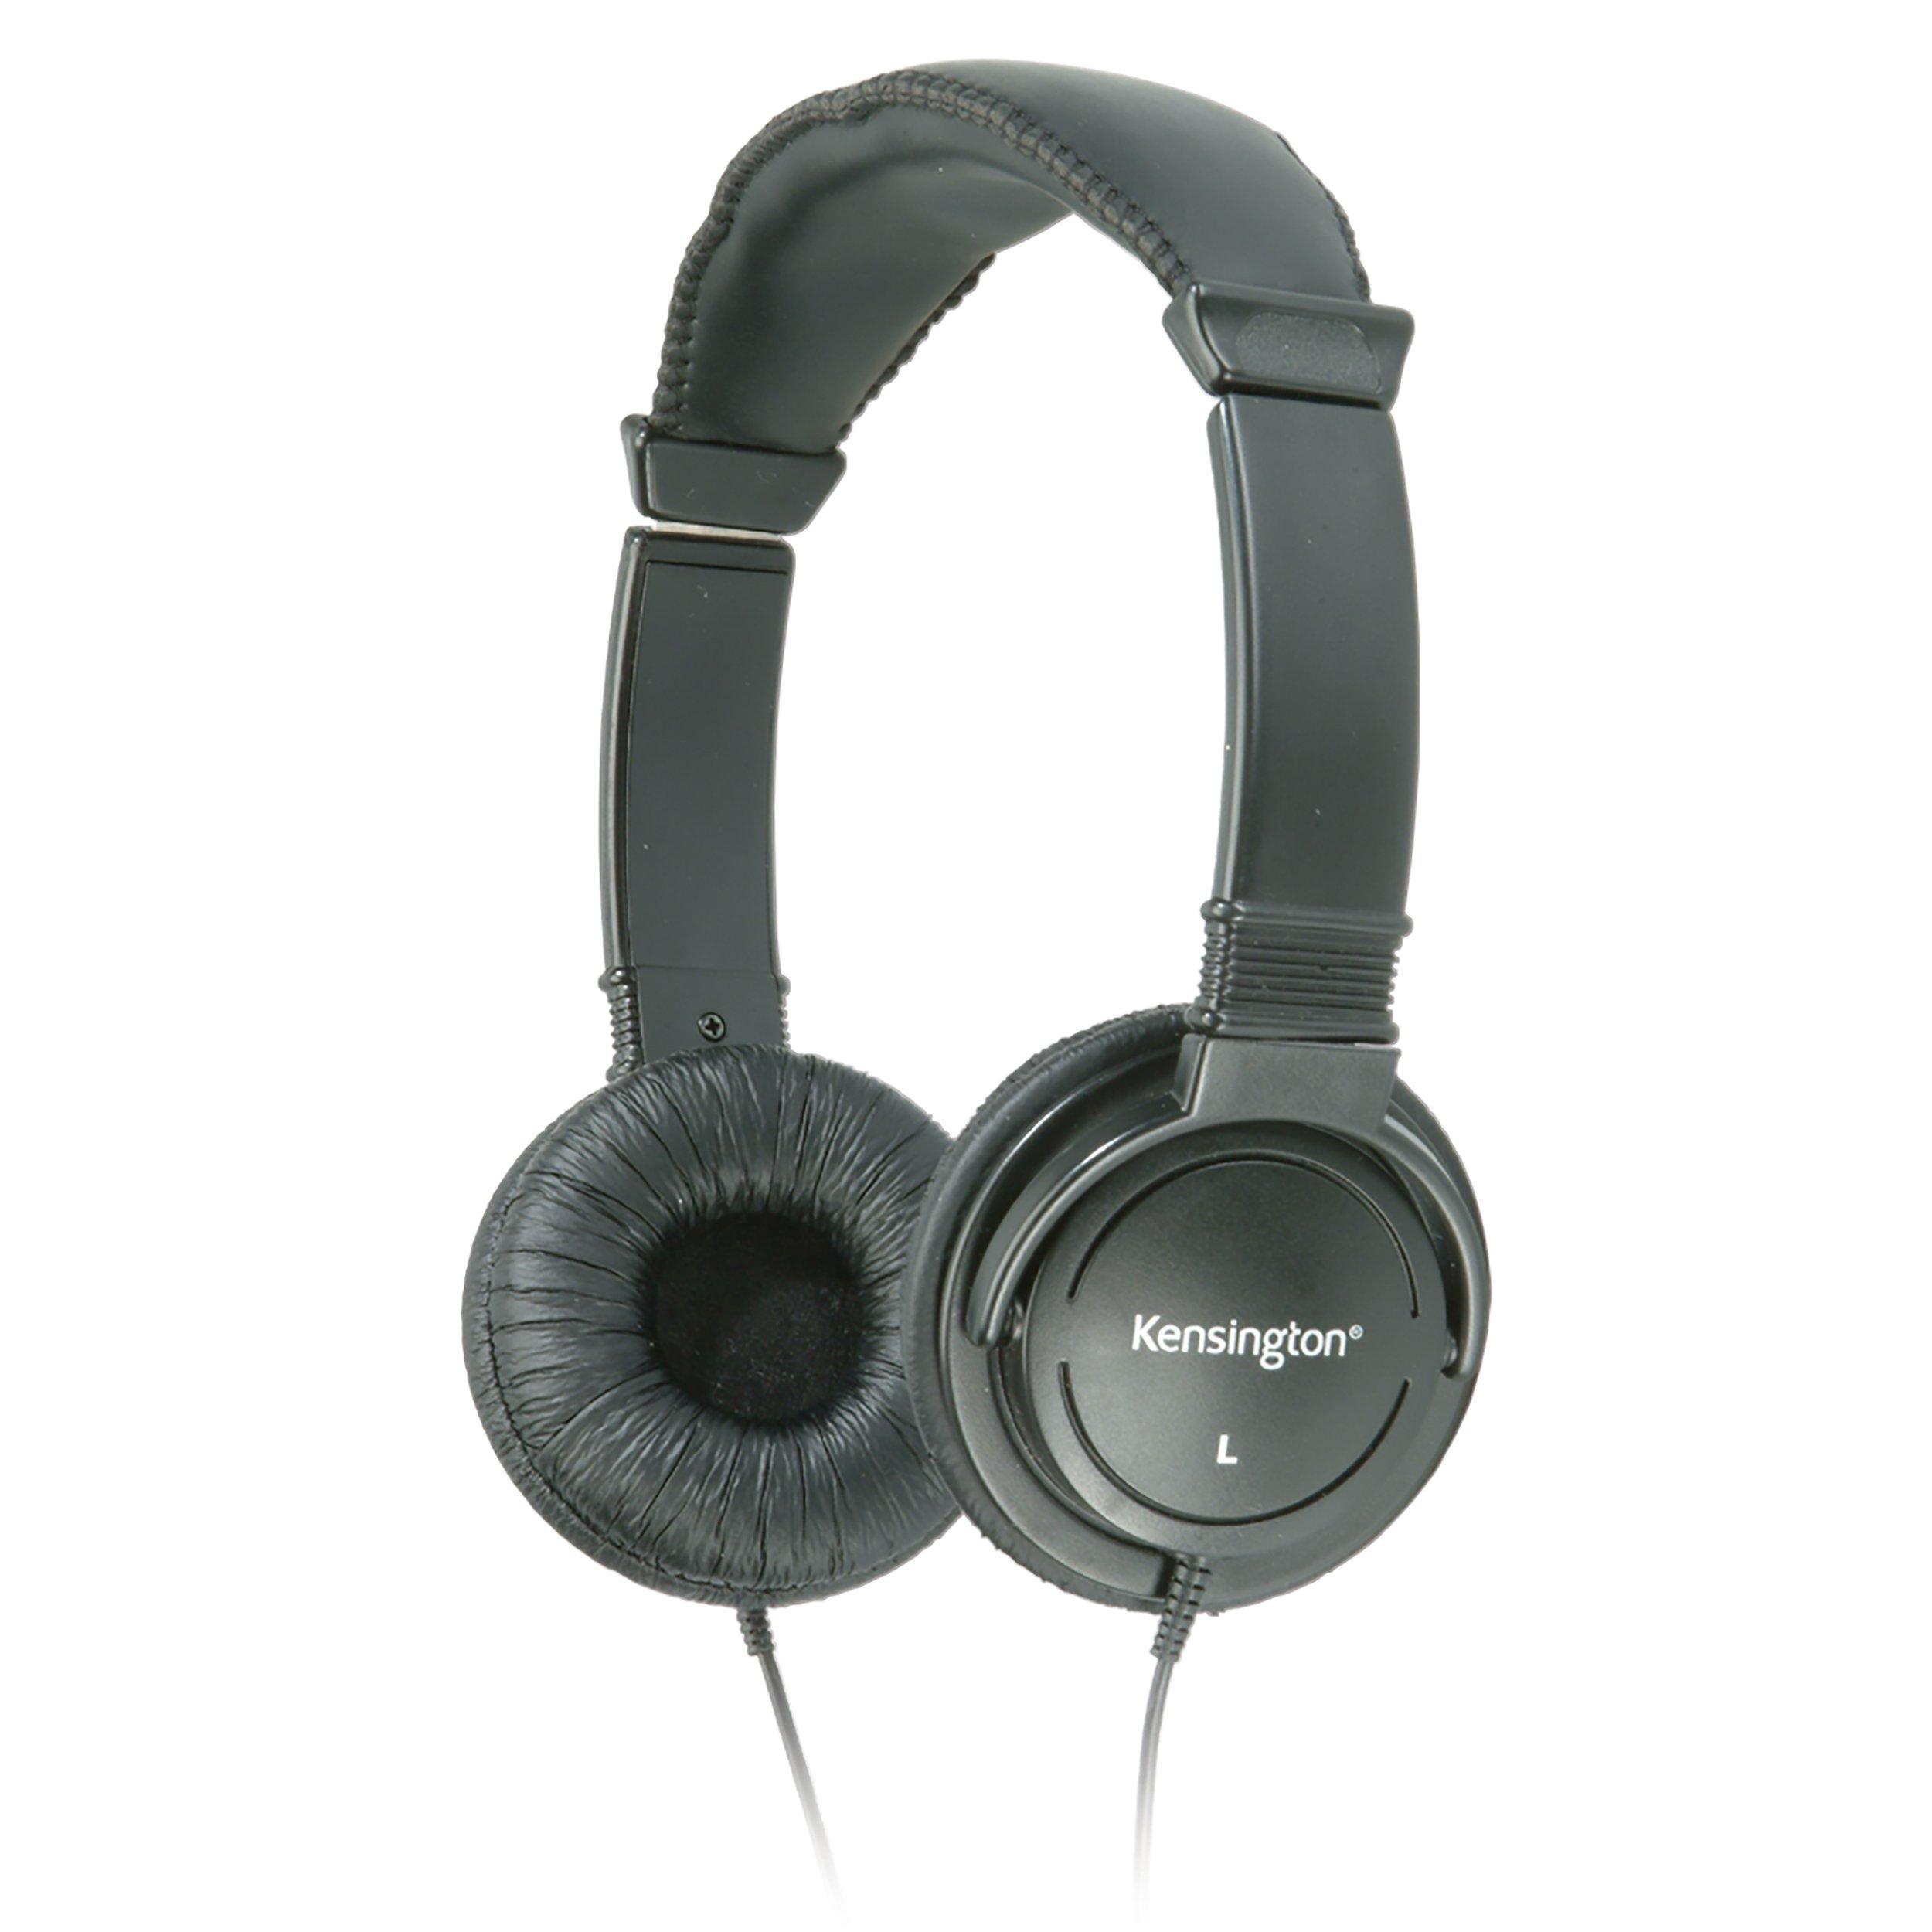 Kensington Hi-Fi On-Ear Headphones with 9-Foot Cord (K33137) by Kensington